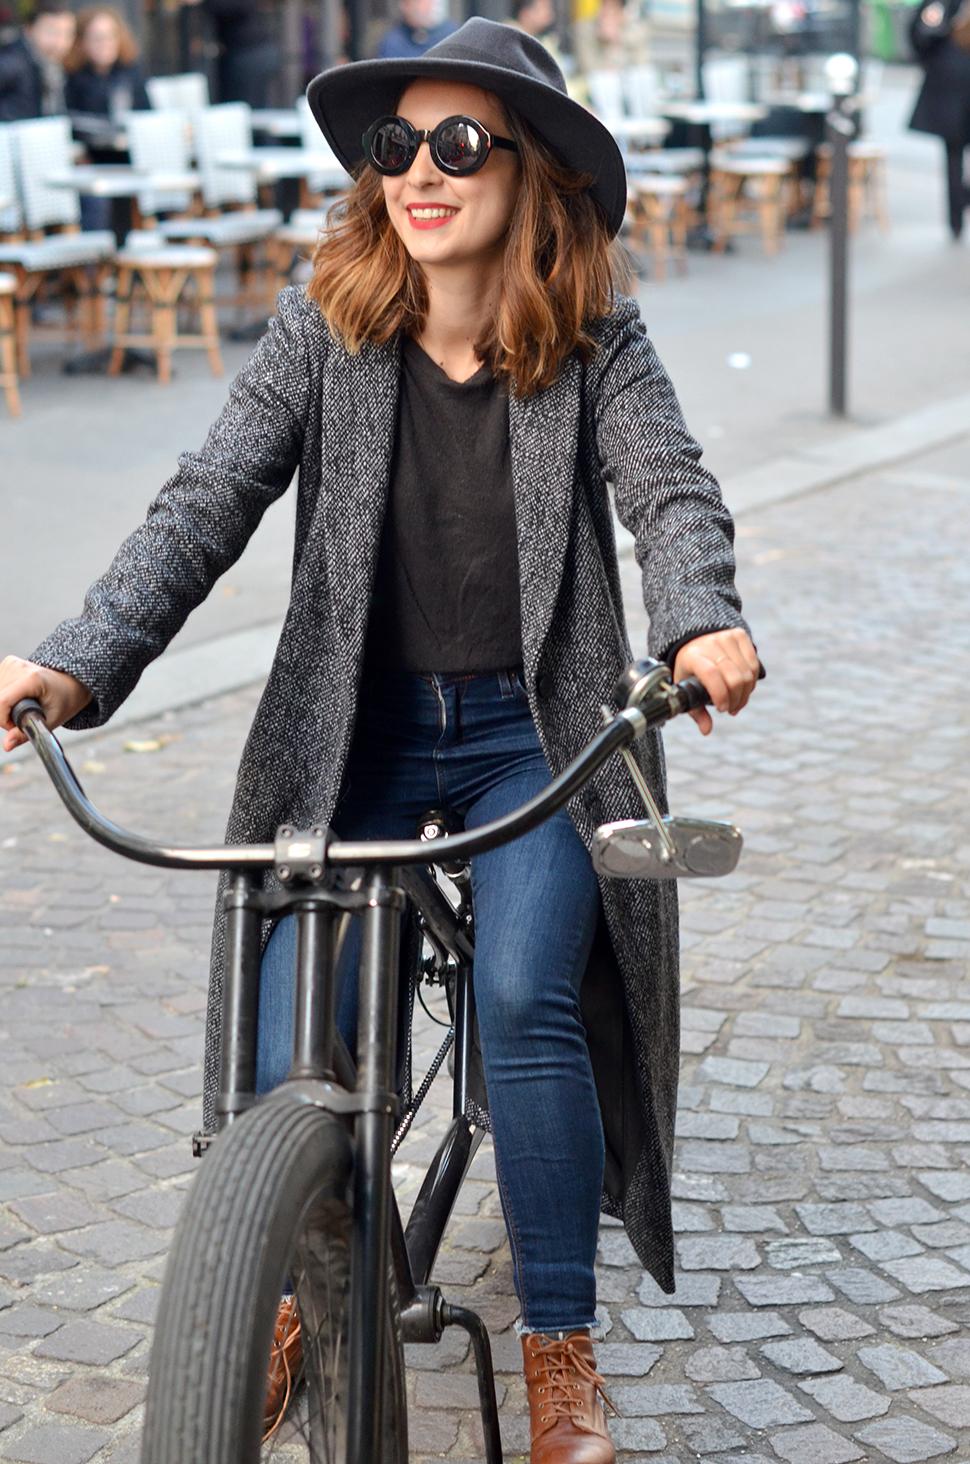 Helloitsvalentine_bikes_8